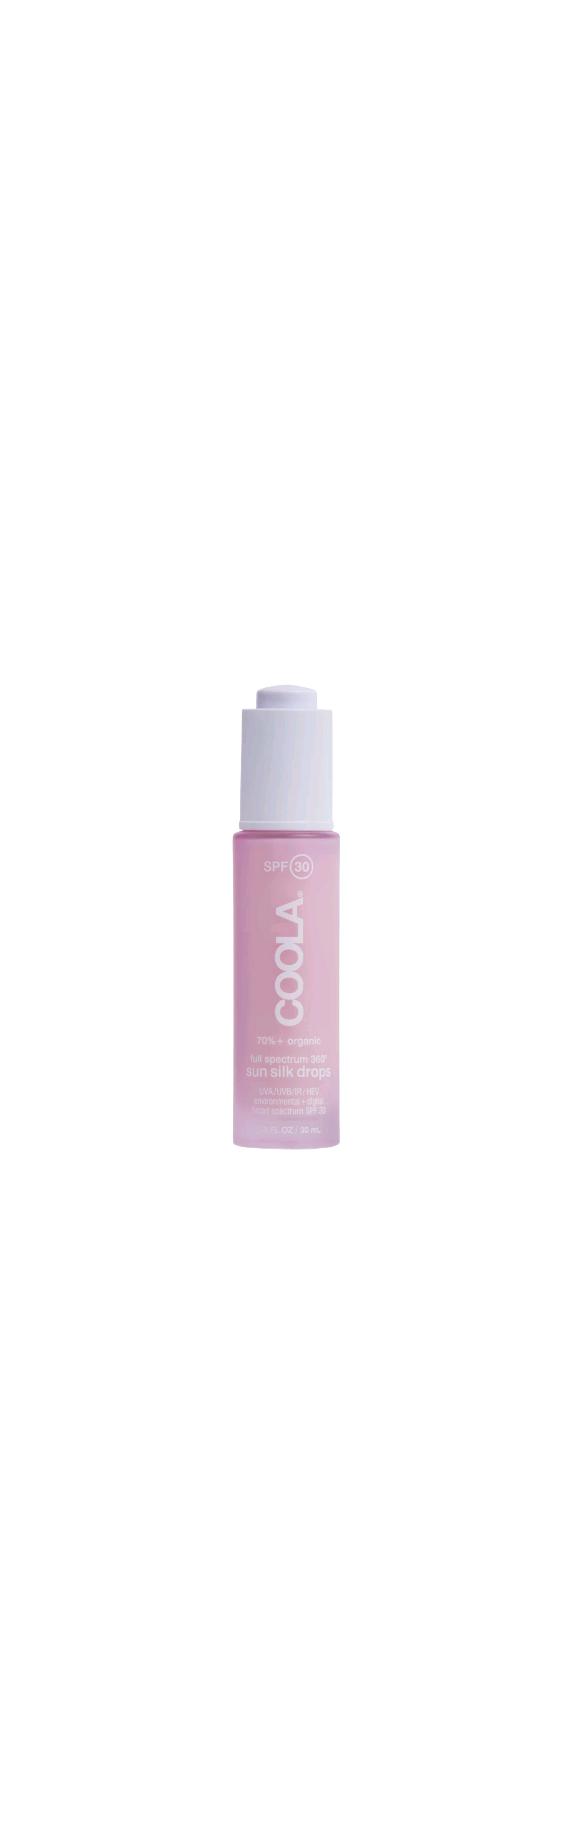 Coola - Classic Full Spectrum Sun Silk Drops Face Sunscreen SPF 30 - 30 ml